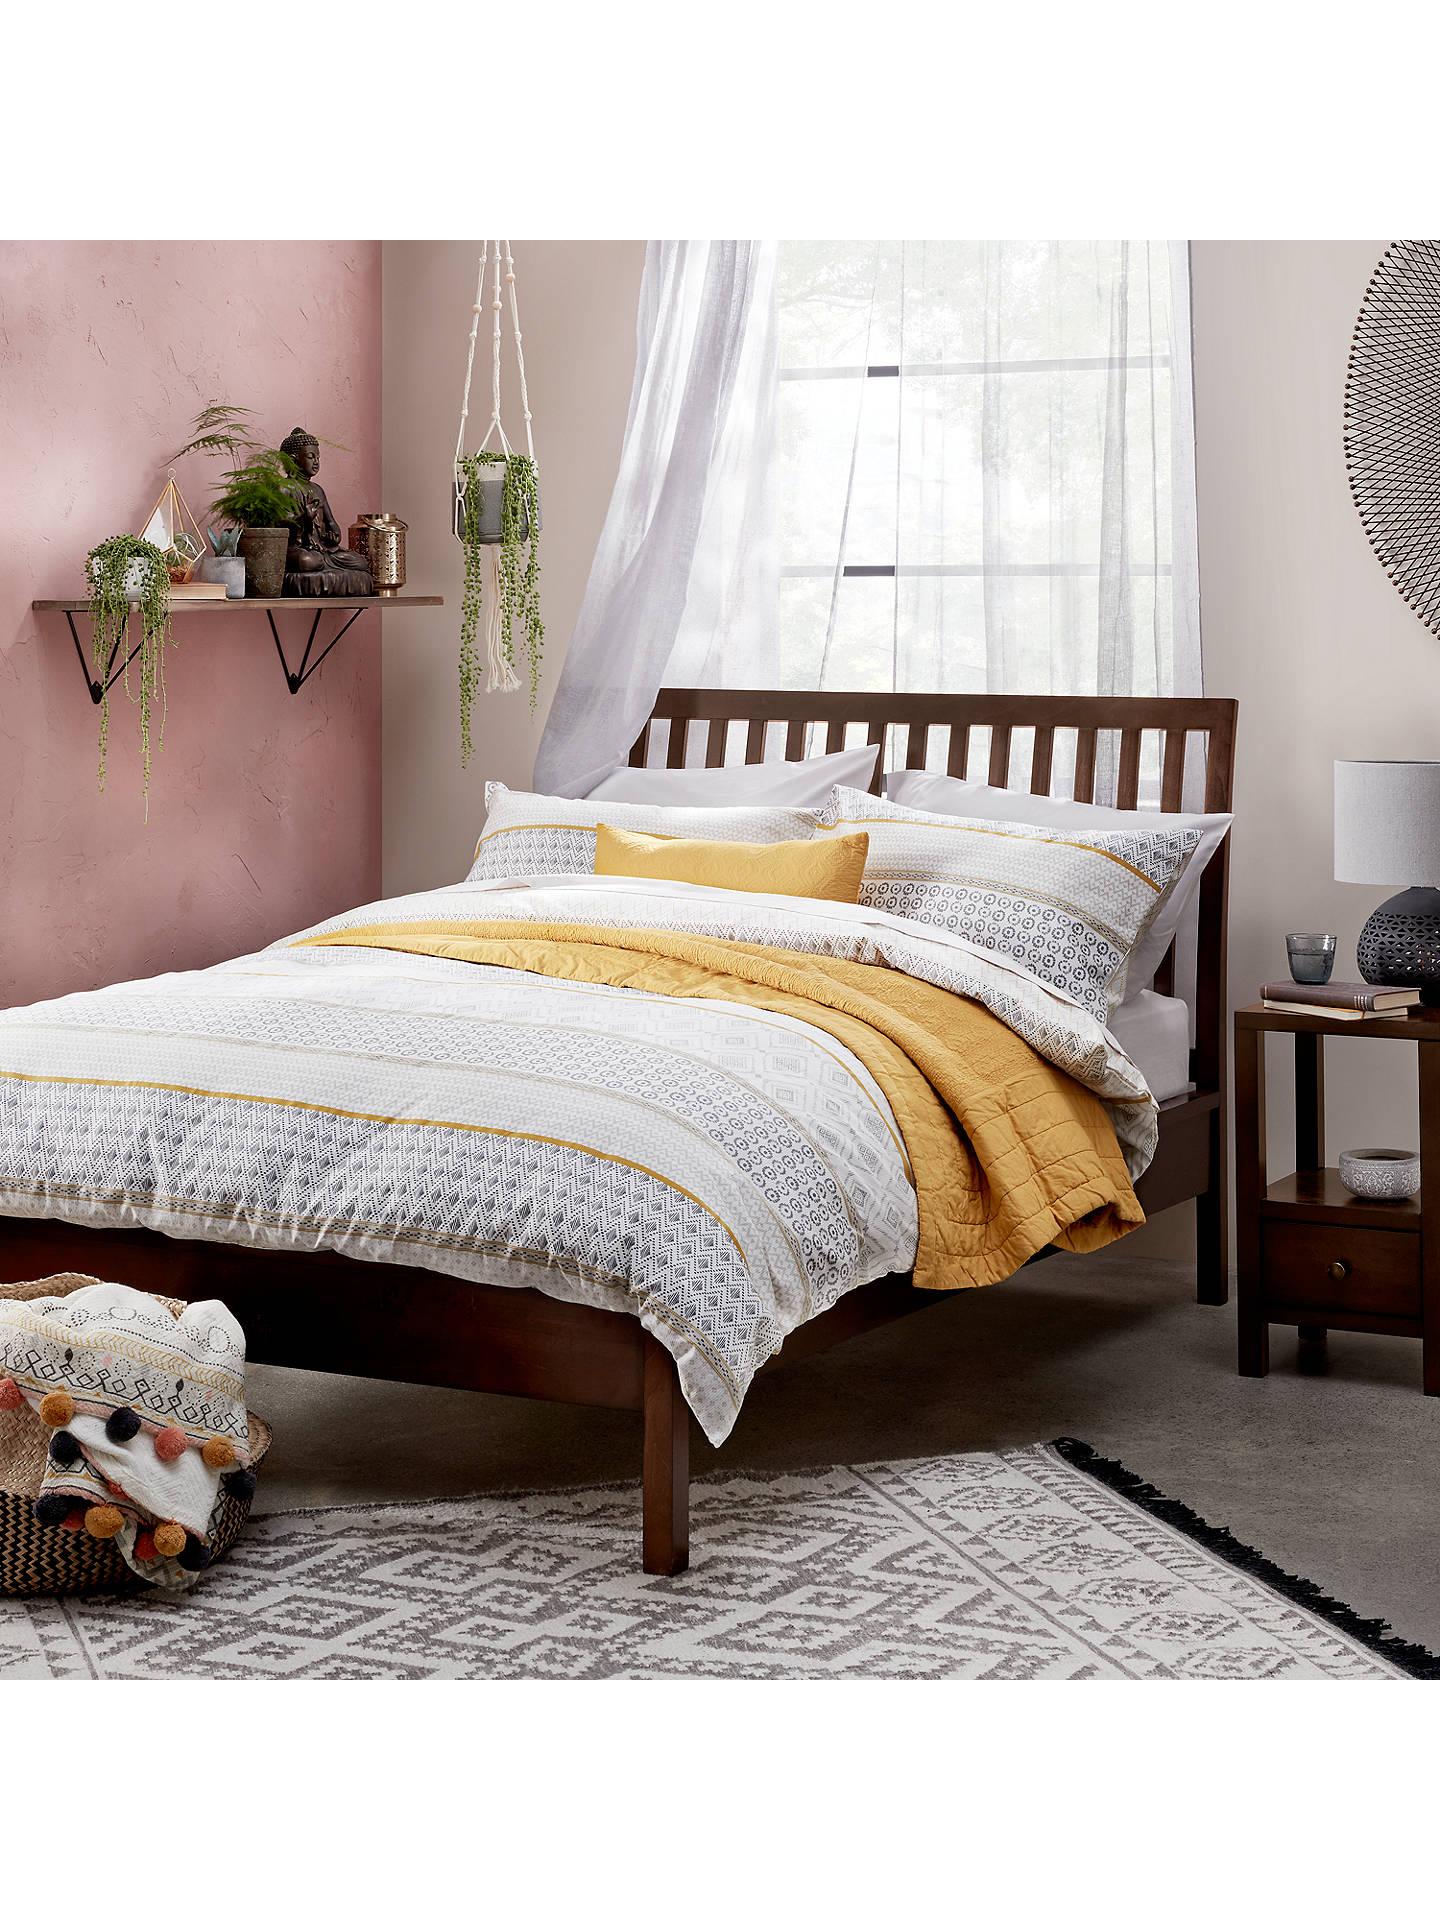 BuyJohn Lewis Partners Medan Bed Frame Double Dark Wood Online At Johnlewis